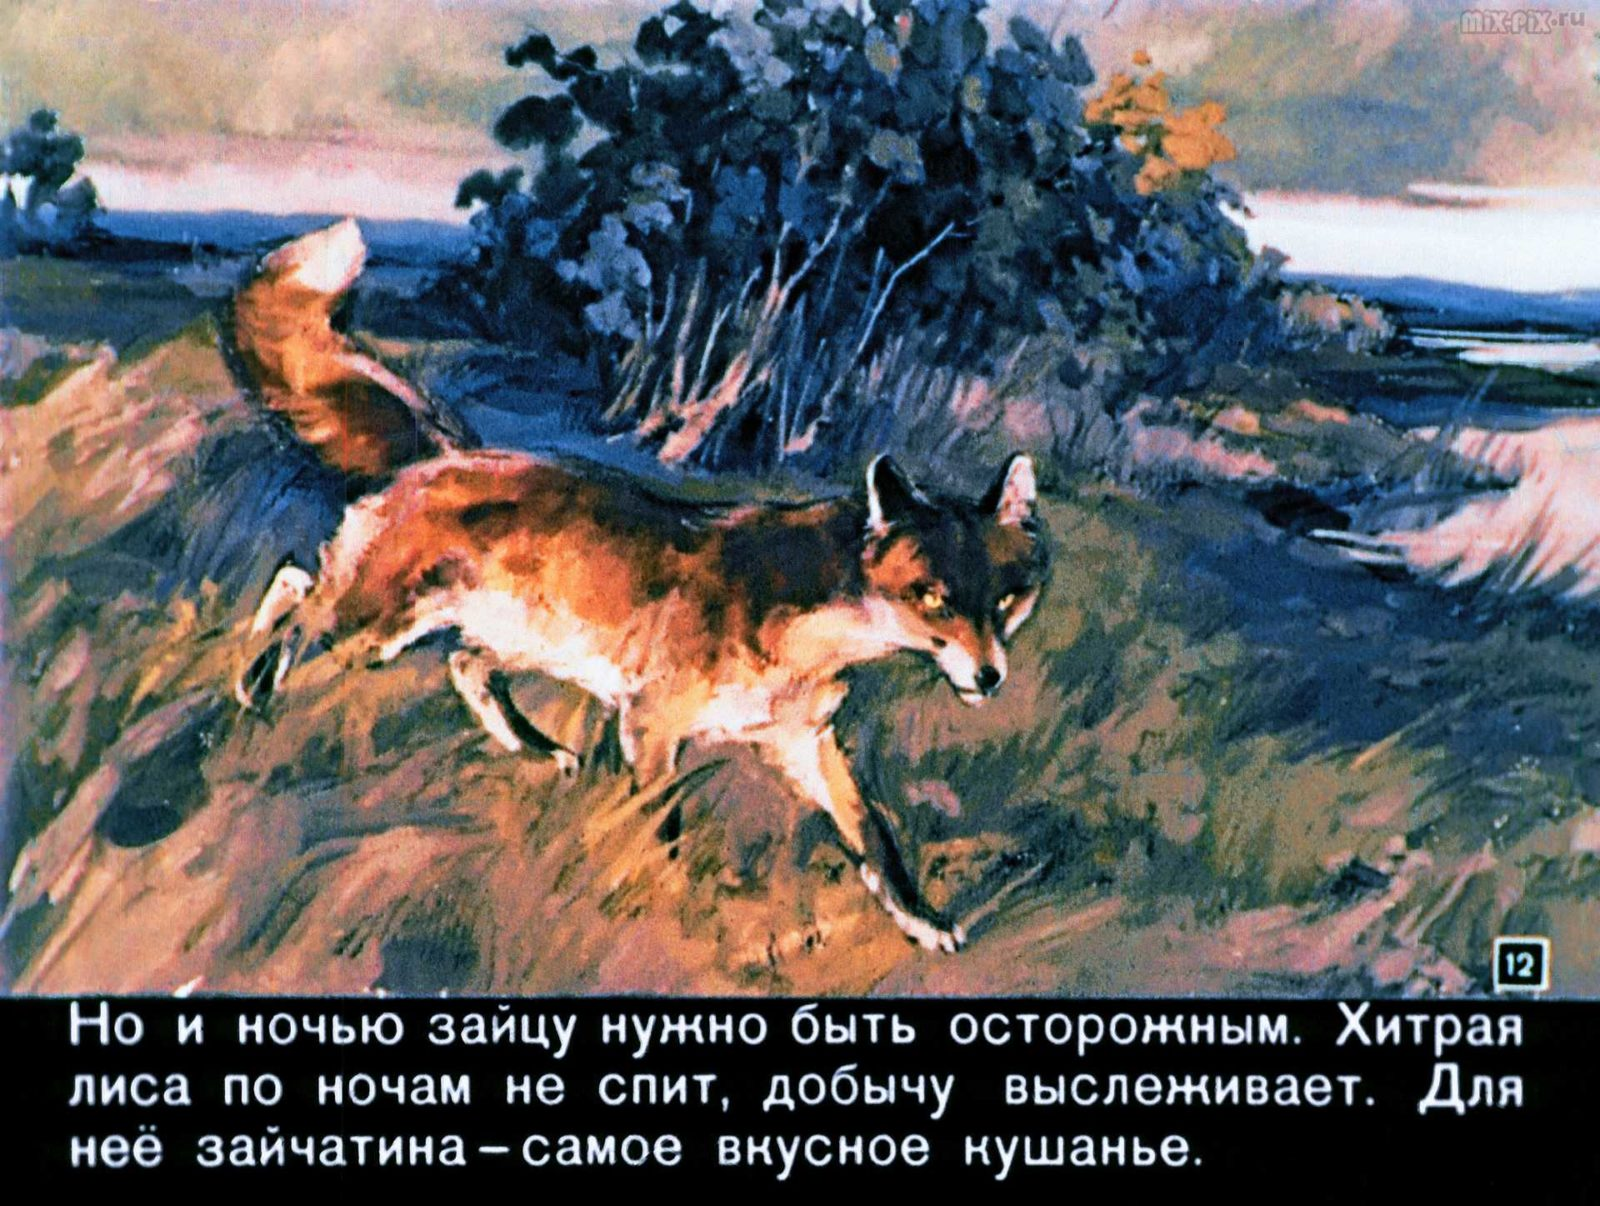 Зайкин год (1958) 36